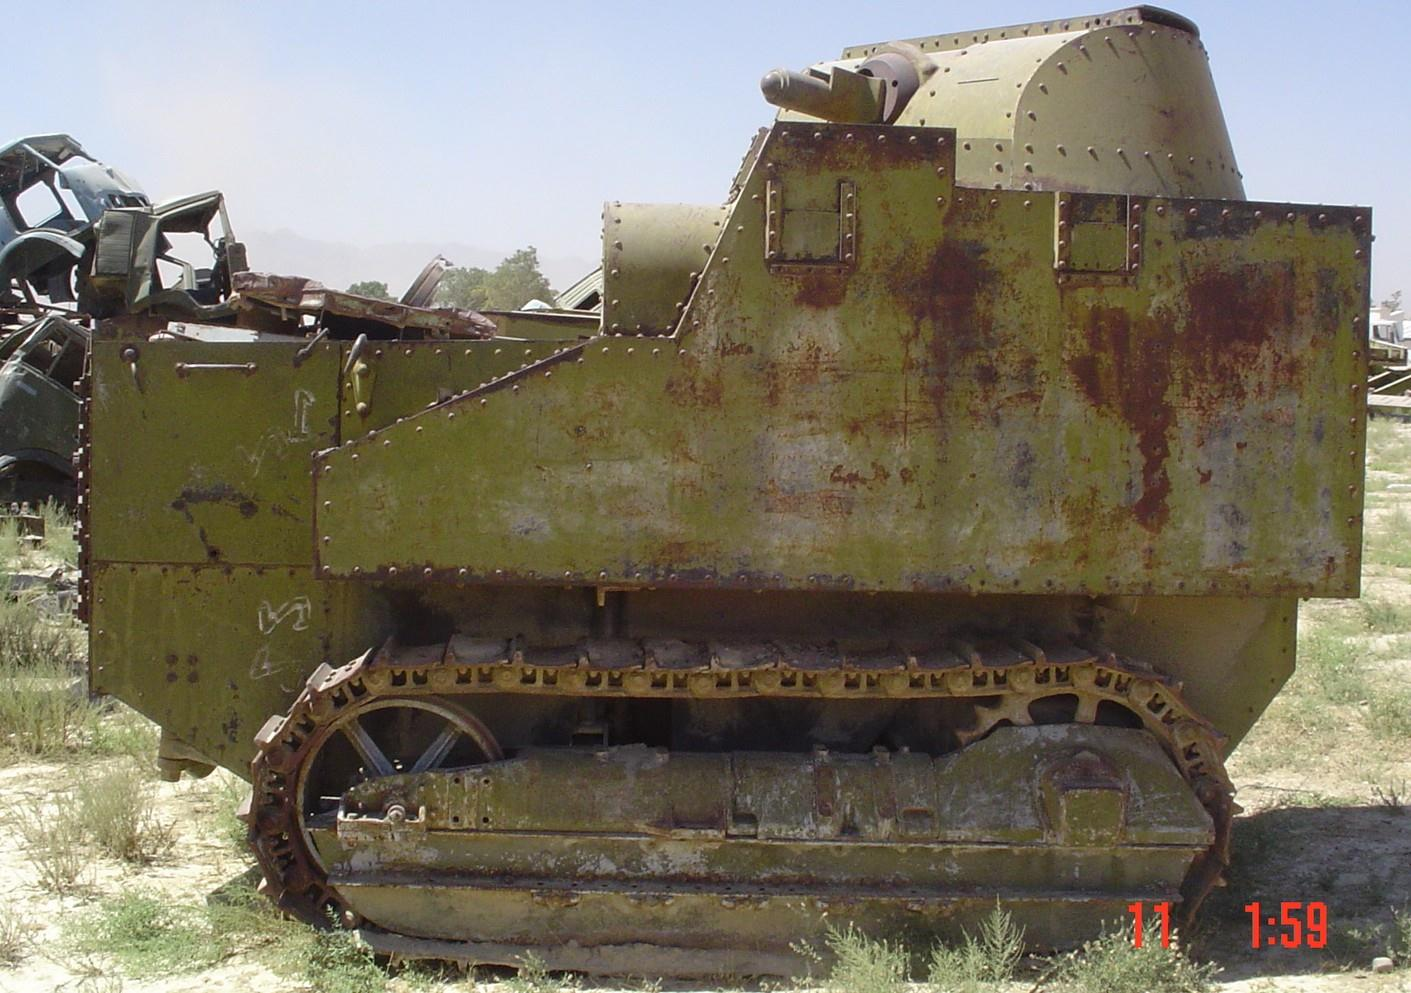 Short-track type Disston Tractor tank, circa 2011